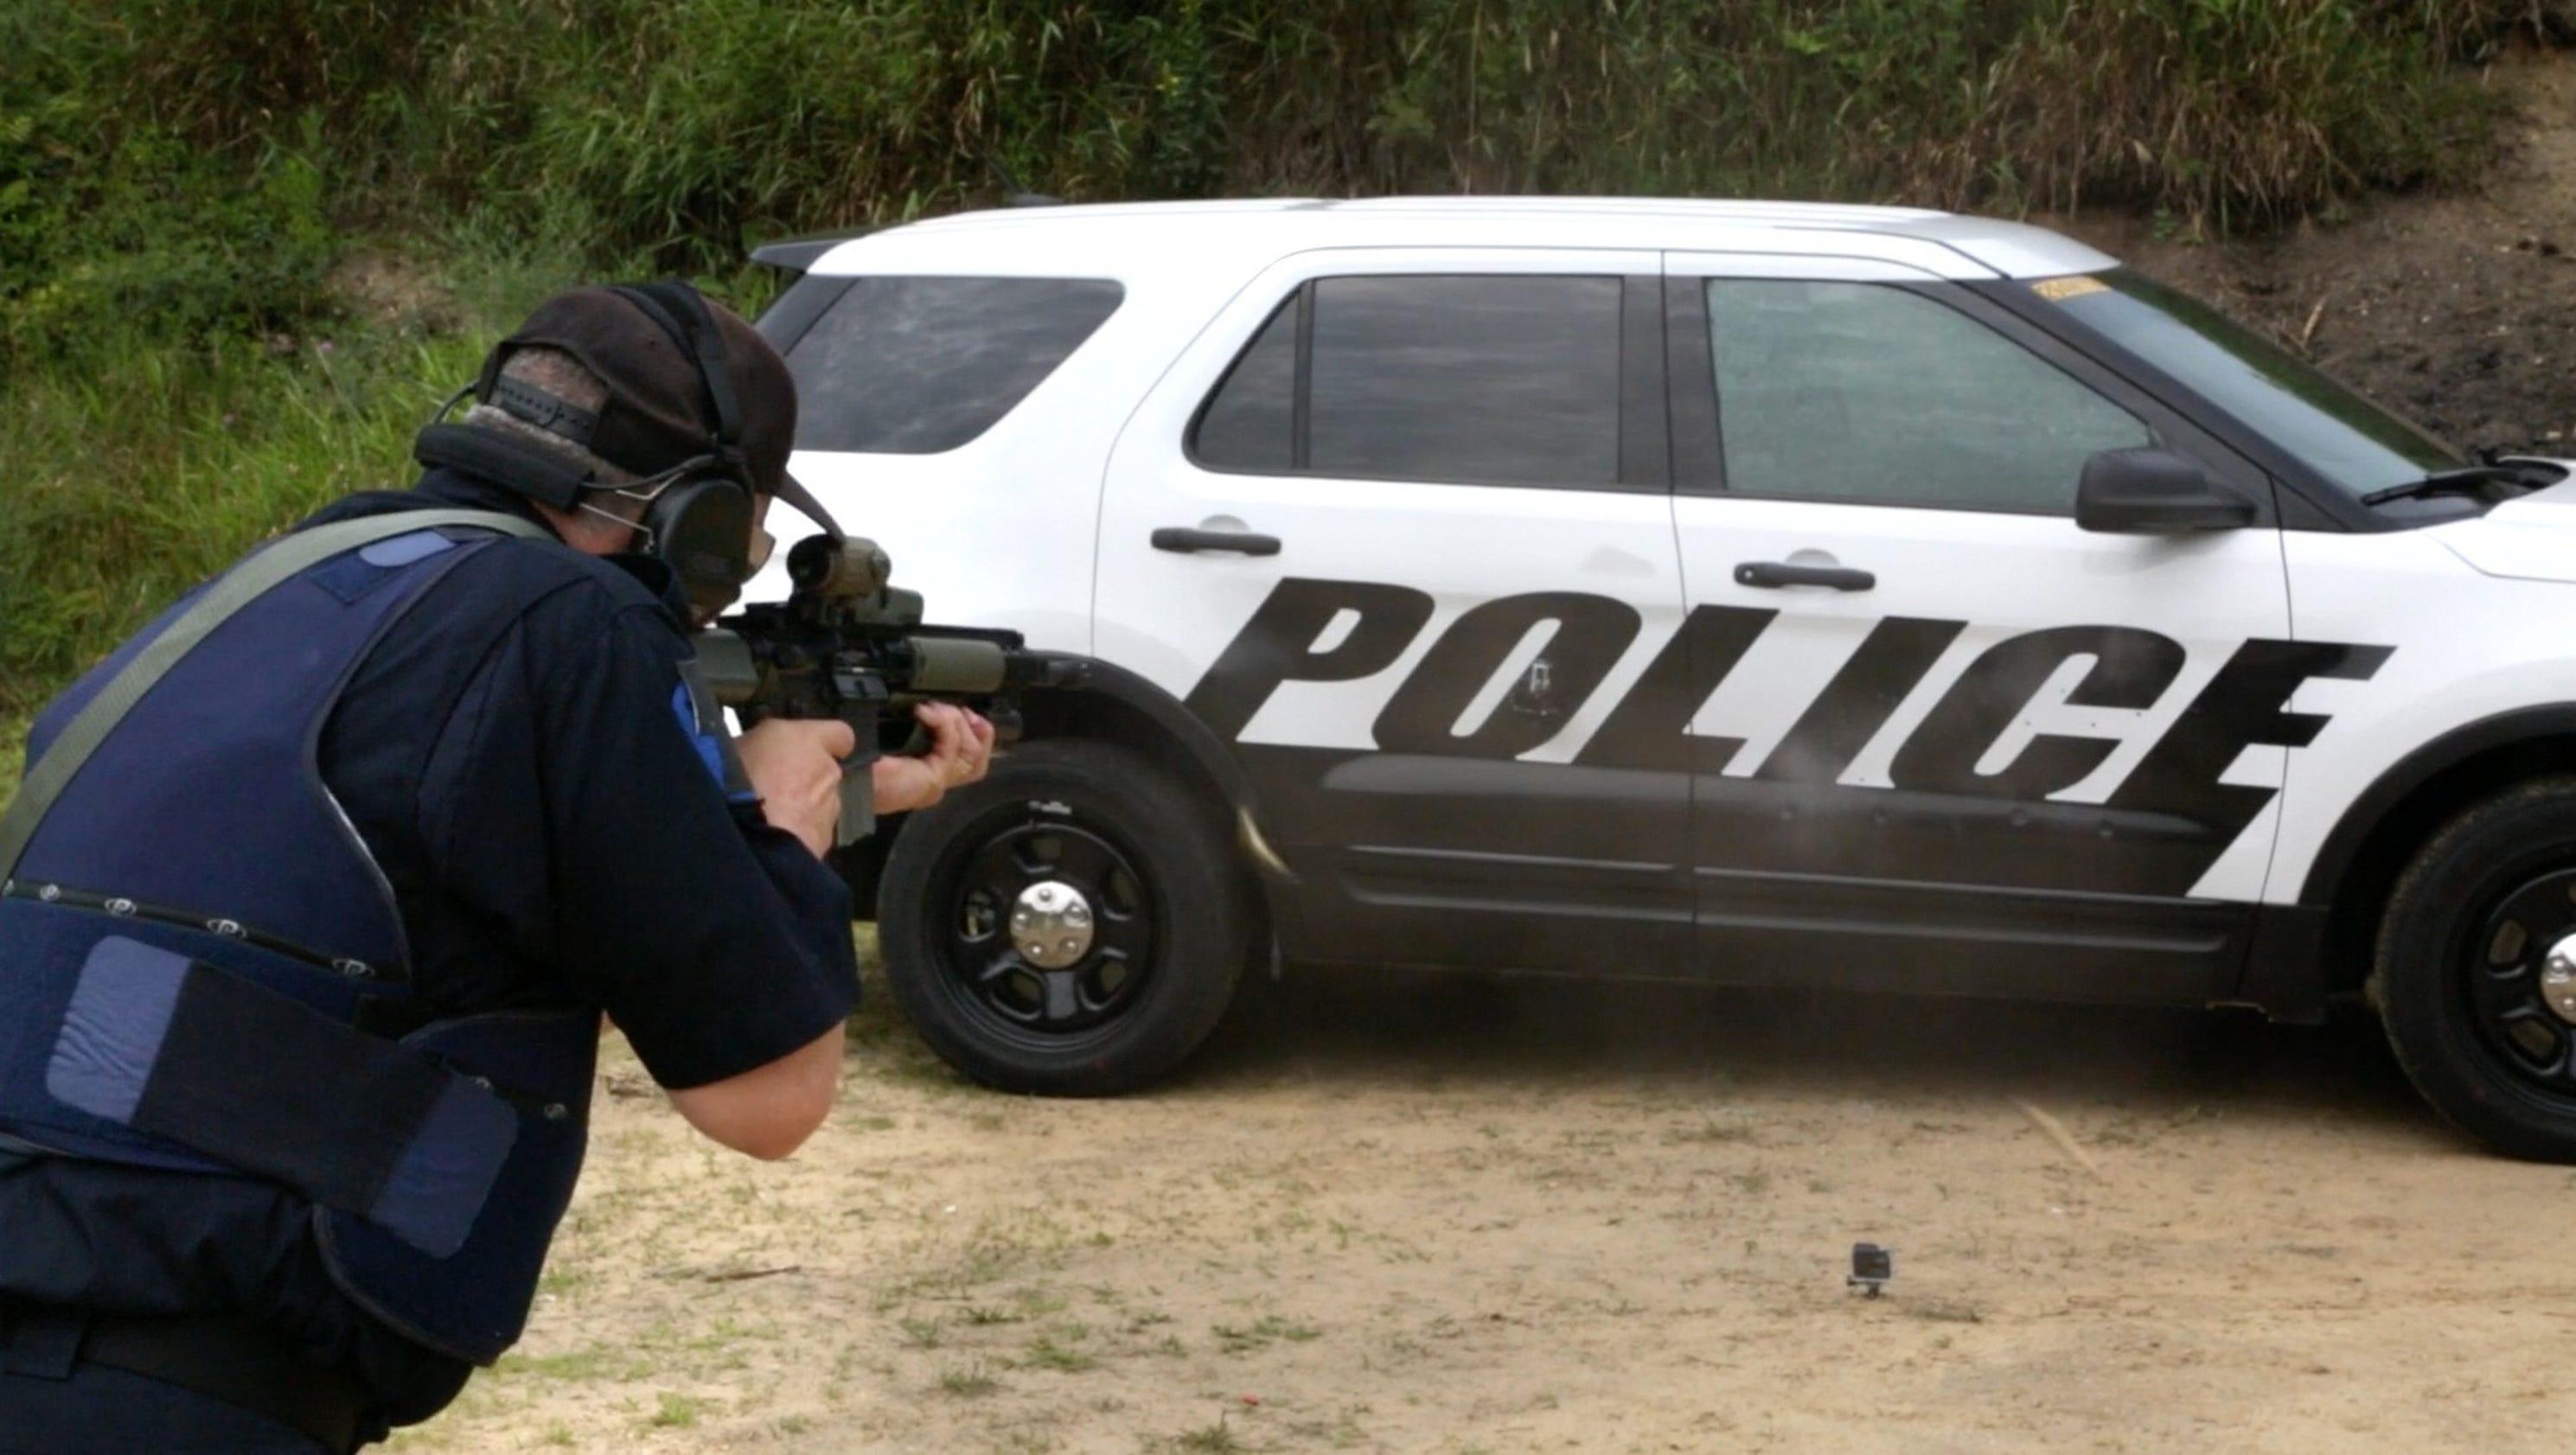 Police Shoot Up Doors Of Ford S Police Interceptor Suv